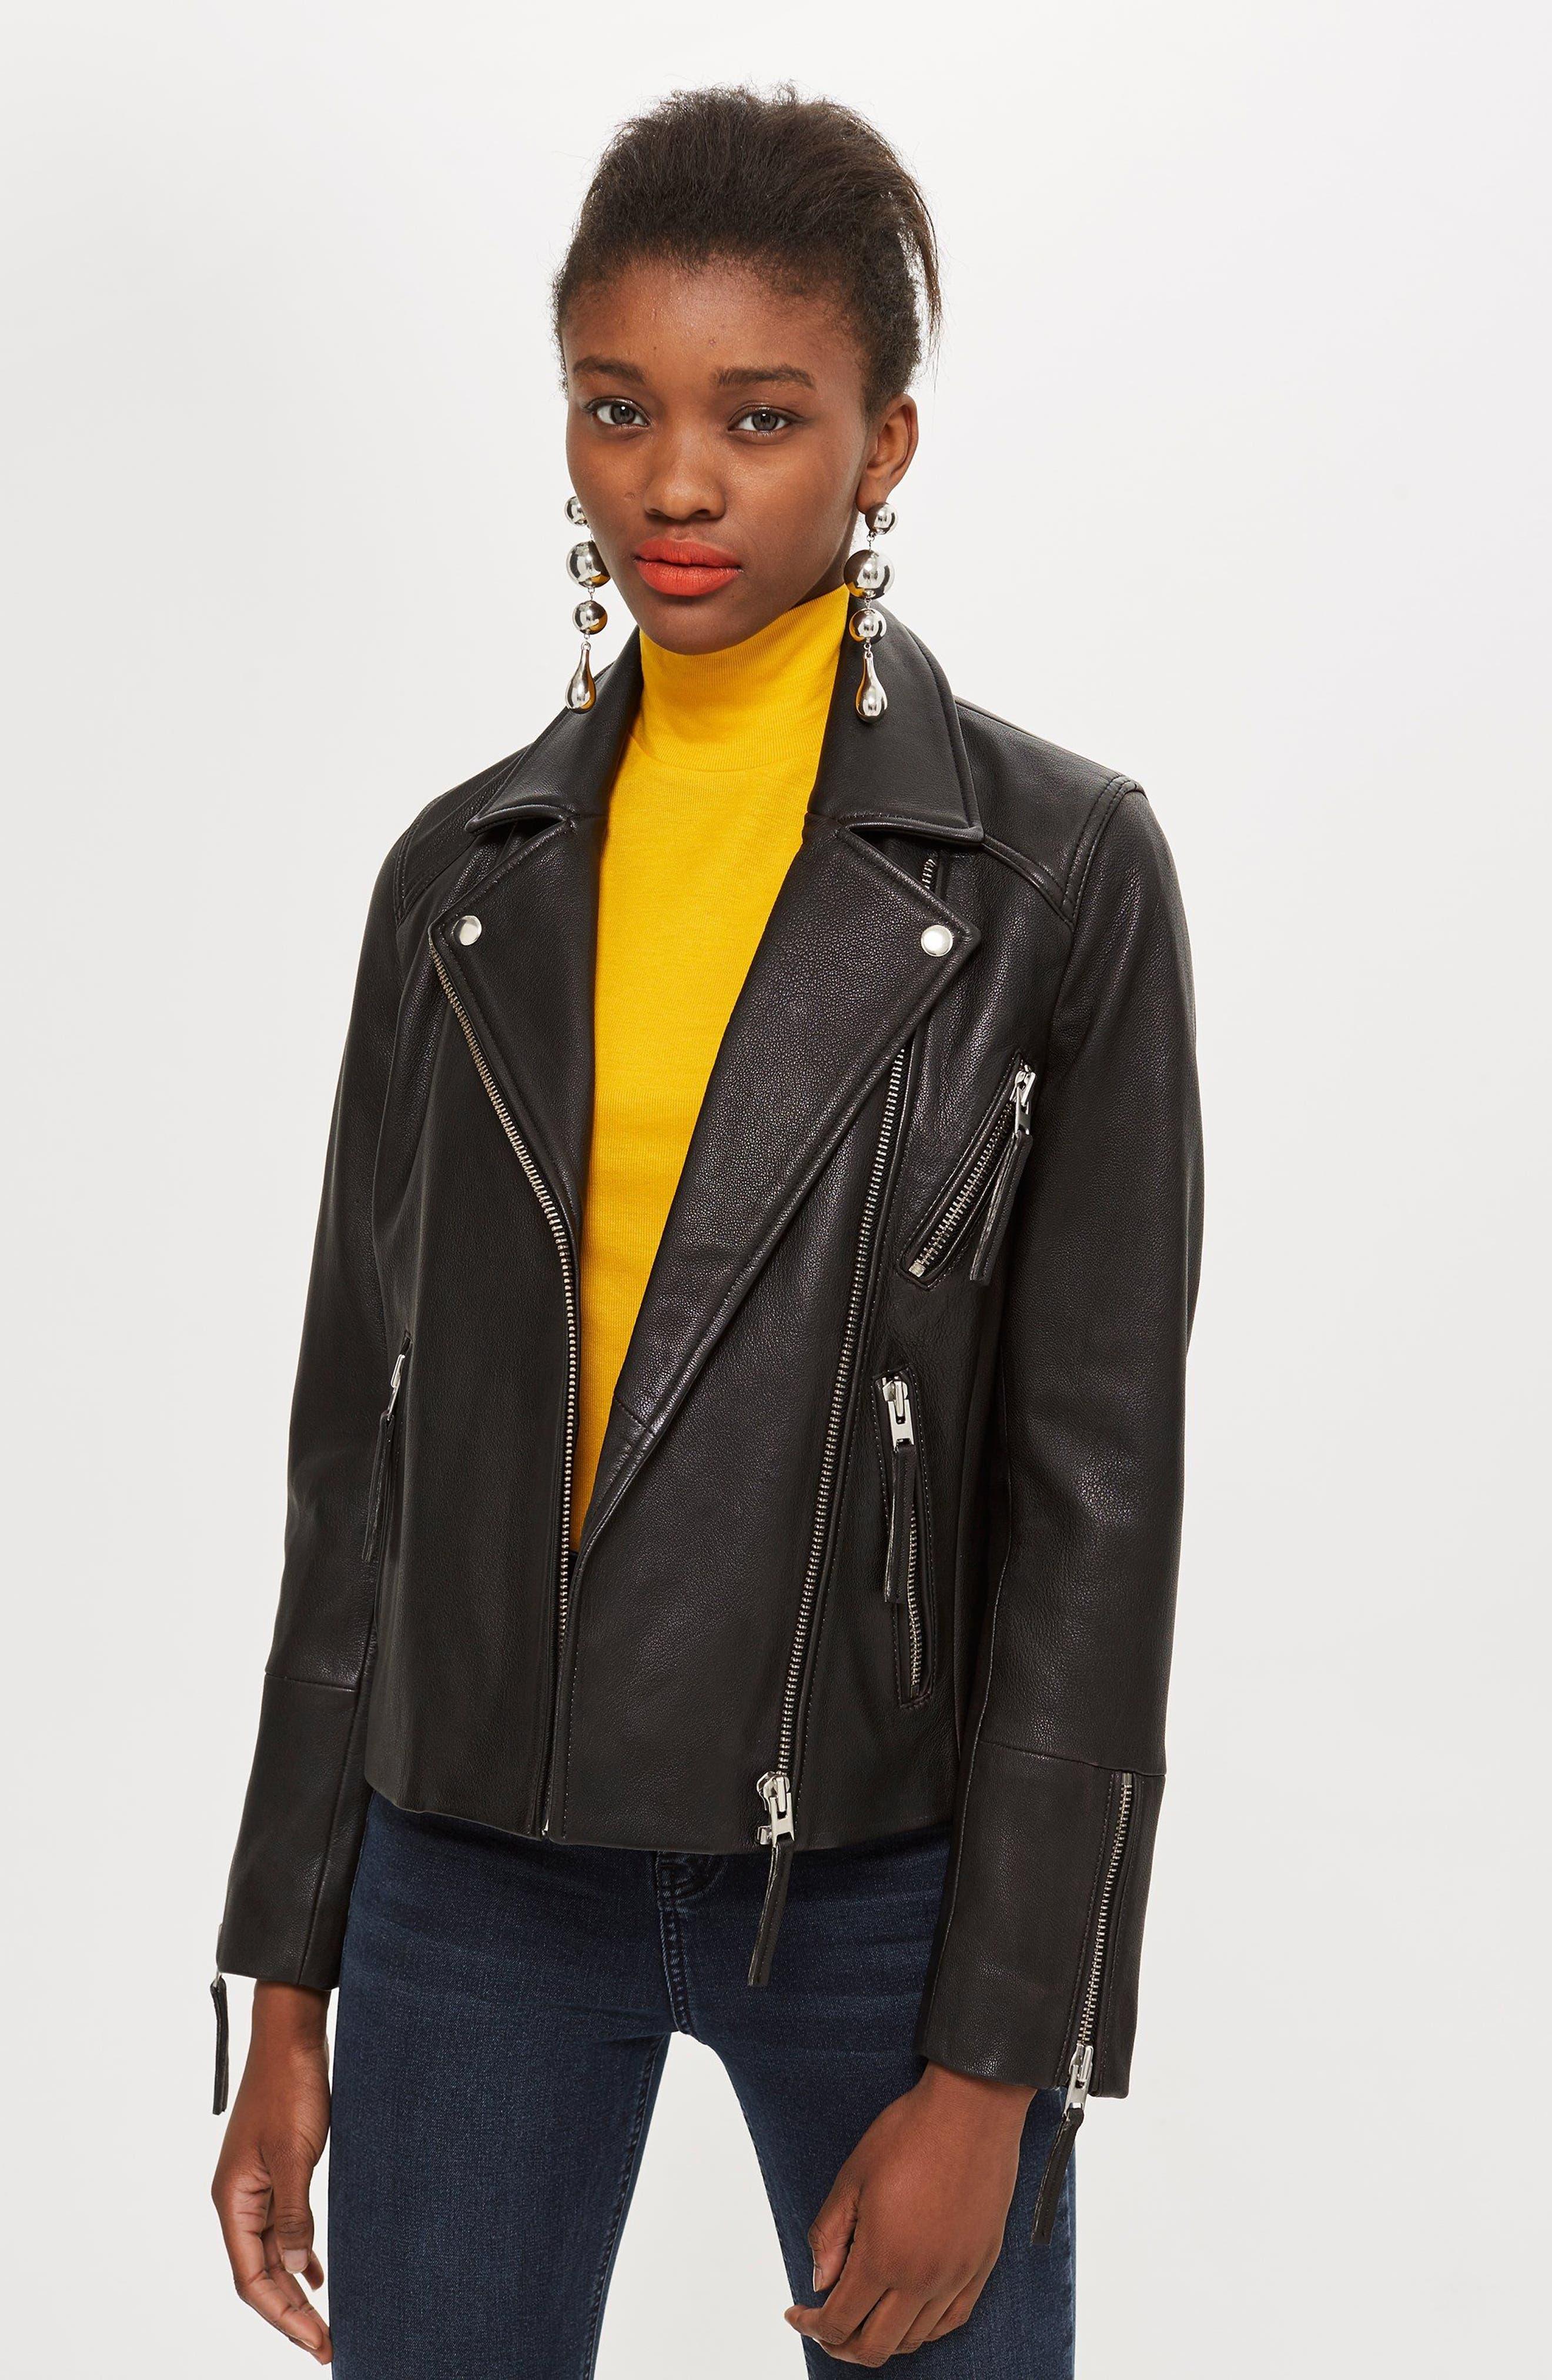 TOPSHOP, Dolly Leather Biker Jacket, Alternate thumbnail 6, color, BLACK